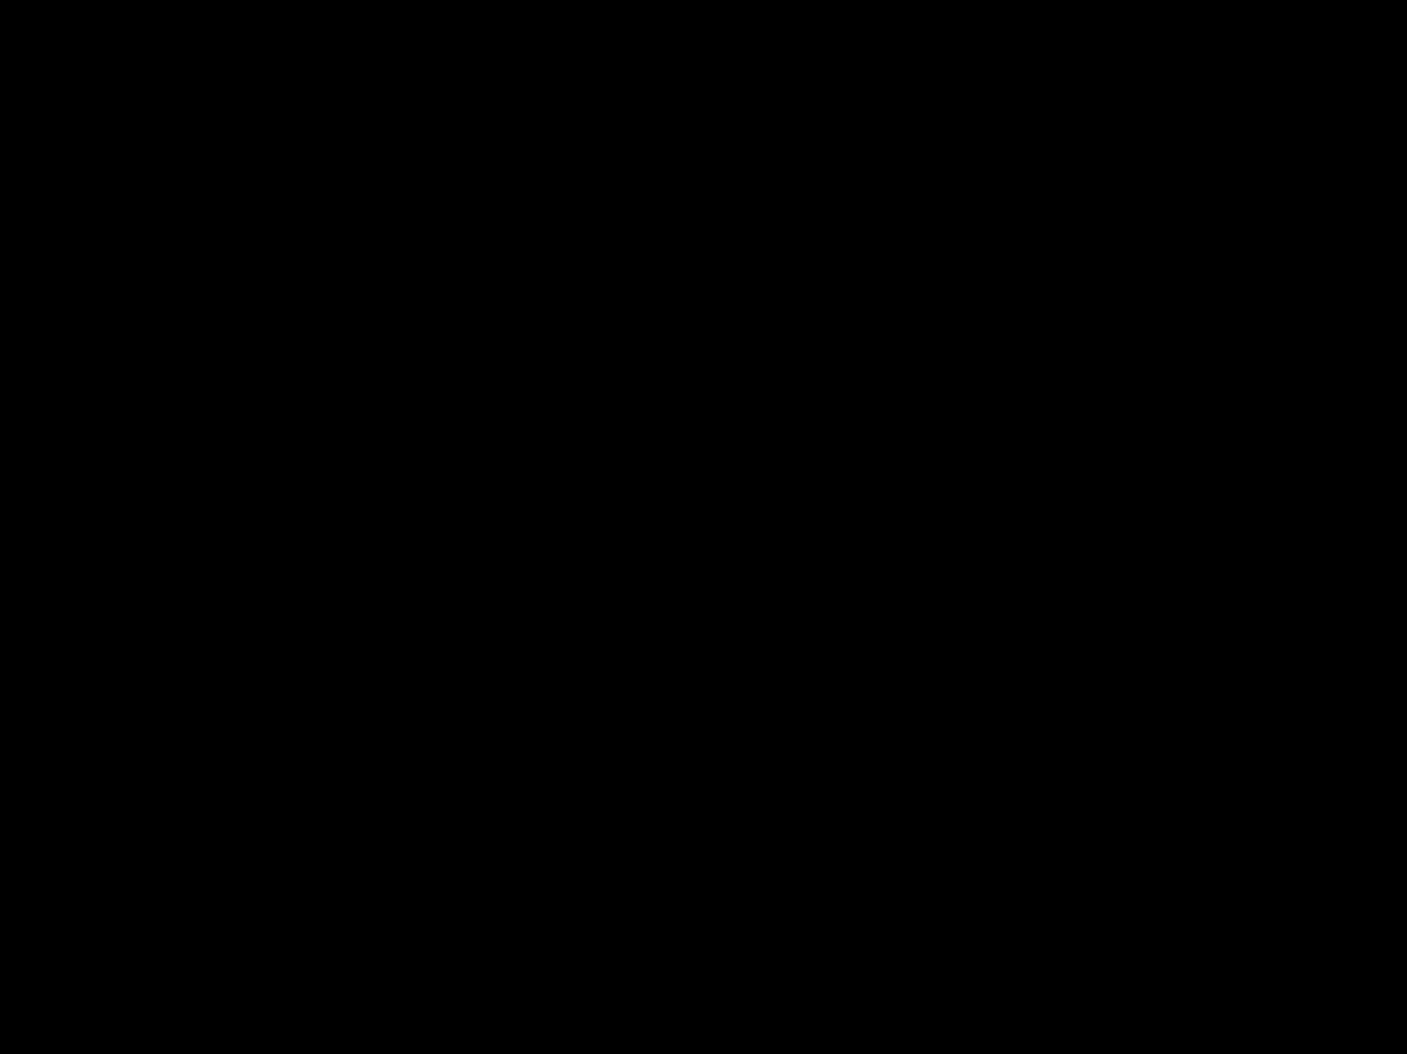 22+ Pikachu Vector Black And White Pics